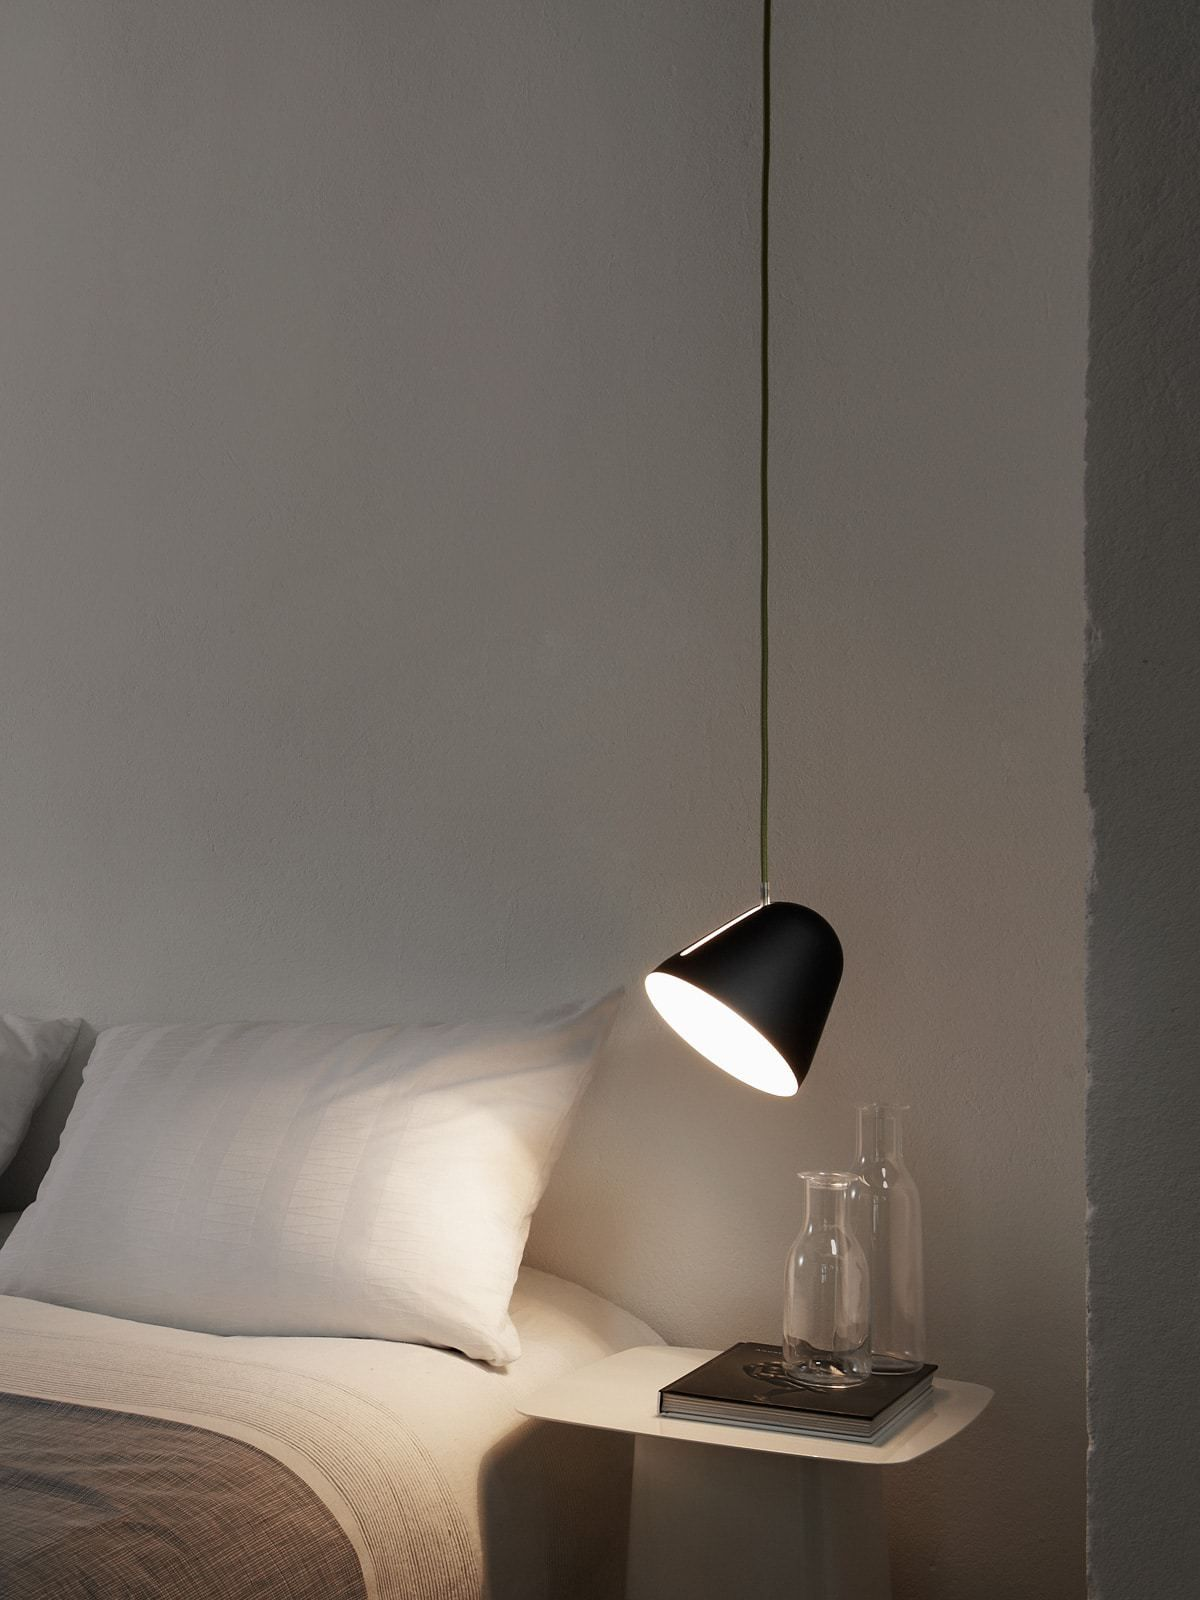 Tilt S Designort Com Anhanger Beleuchtung Schlafzimmer